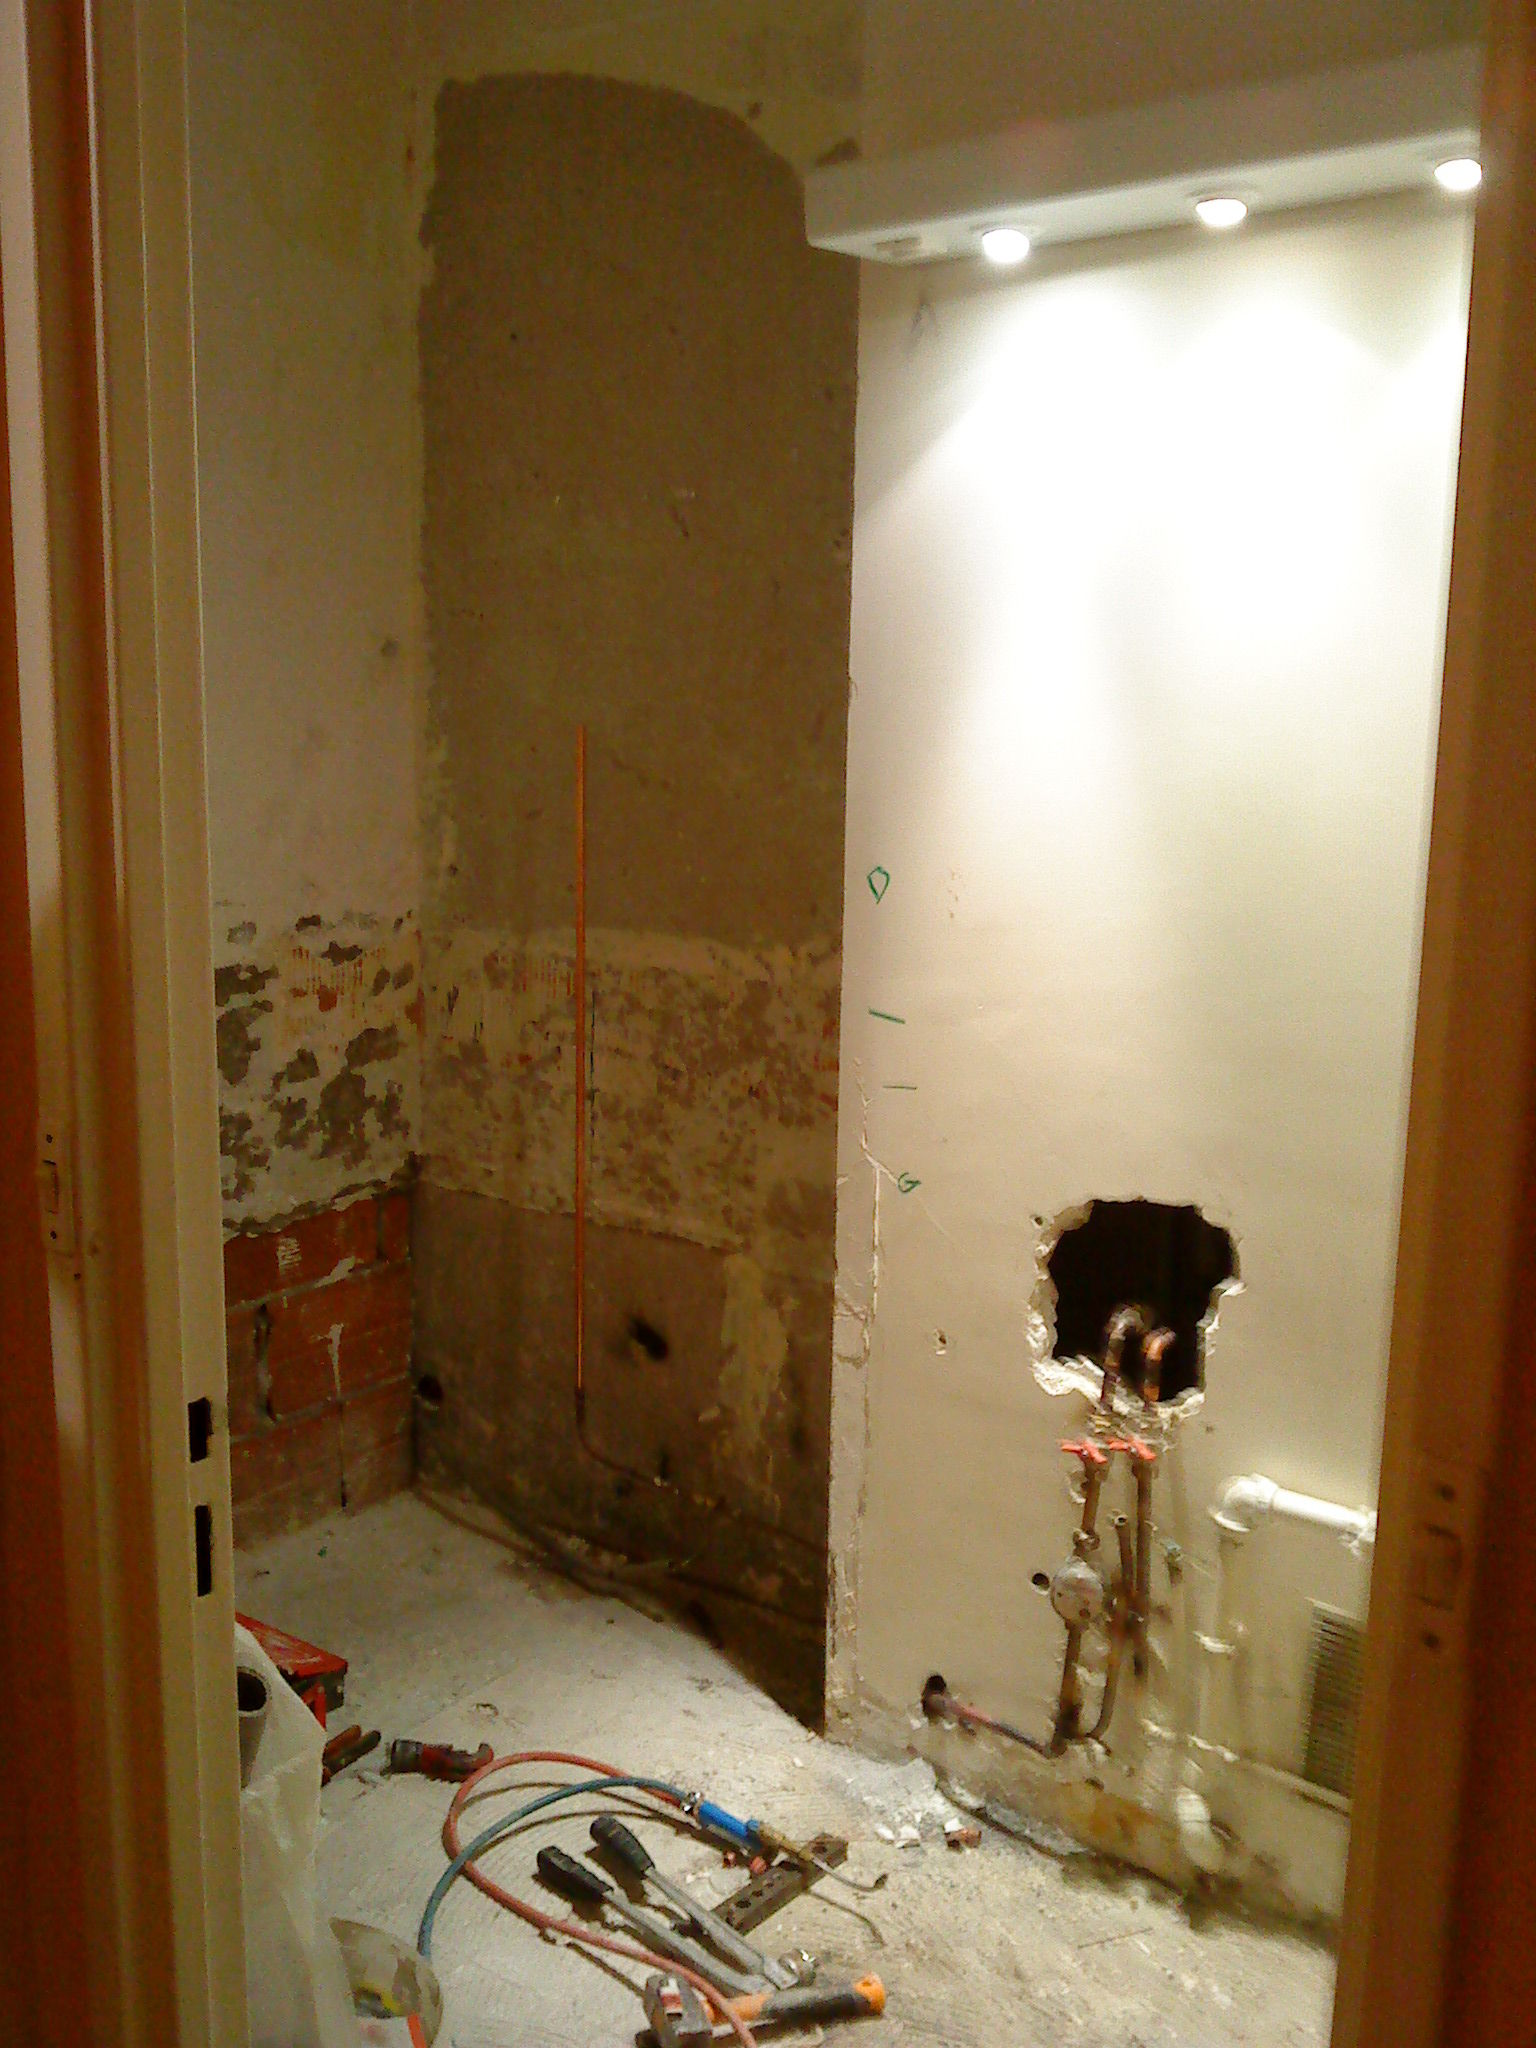 Pendant travaux salle de bain photo de salle de bain - Travaux de salle de bain ...